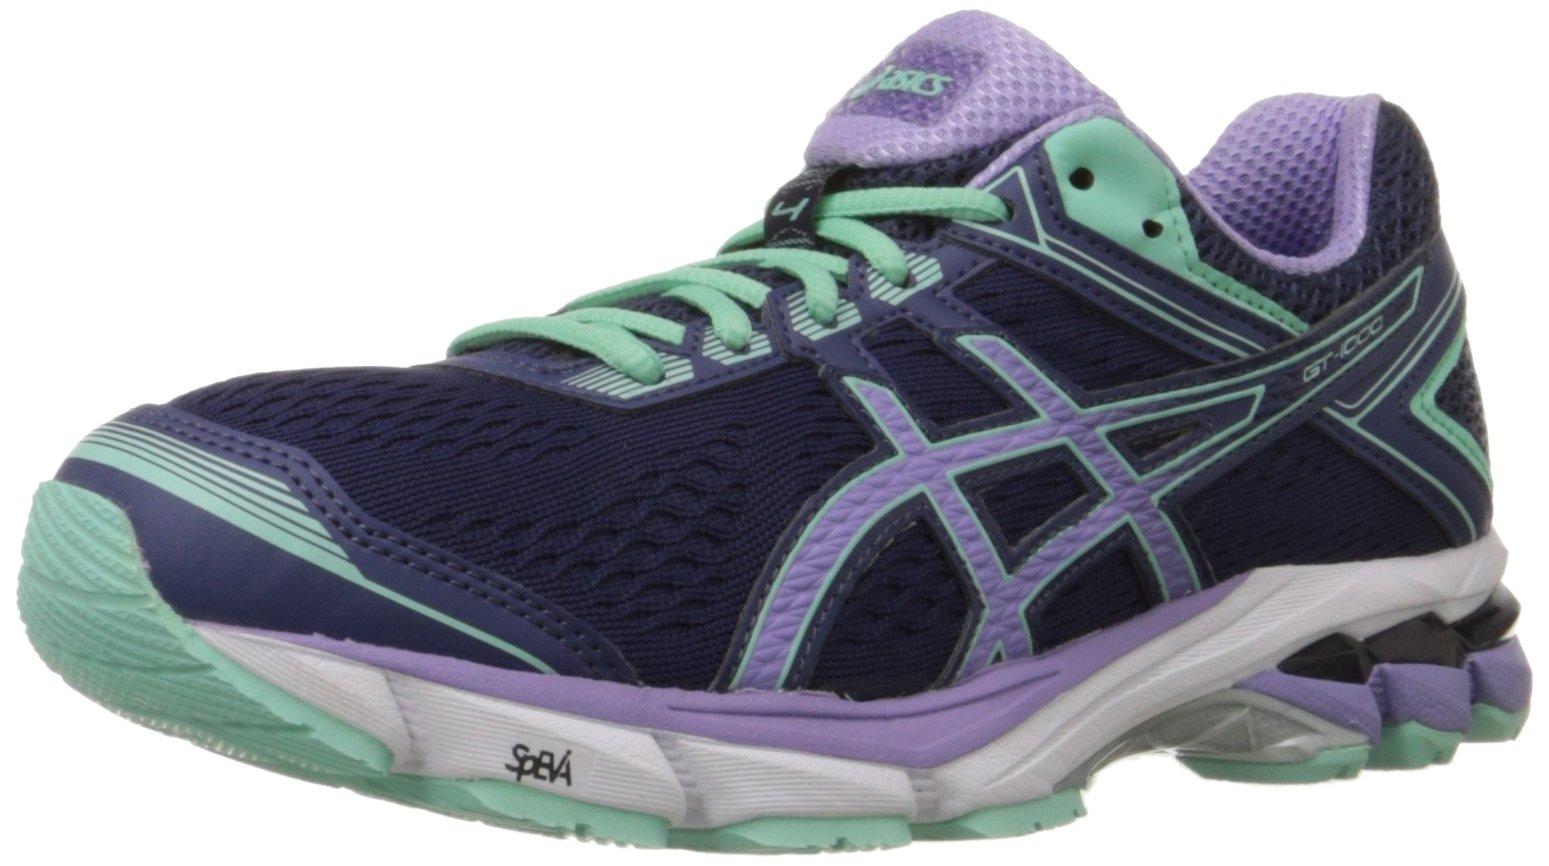 ASICS Women's Gt-1000 4 Running Shoe, Midnight/Violet/Beach Glass, 7.5 M US